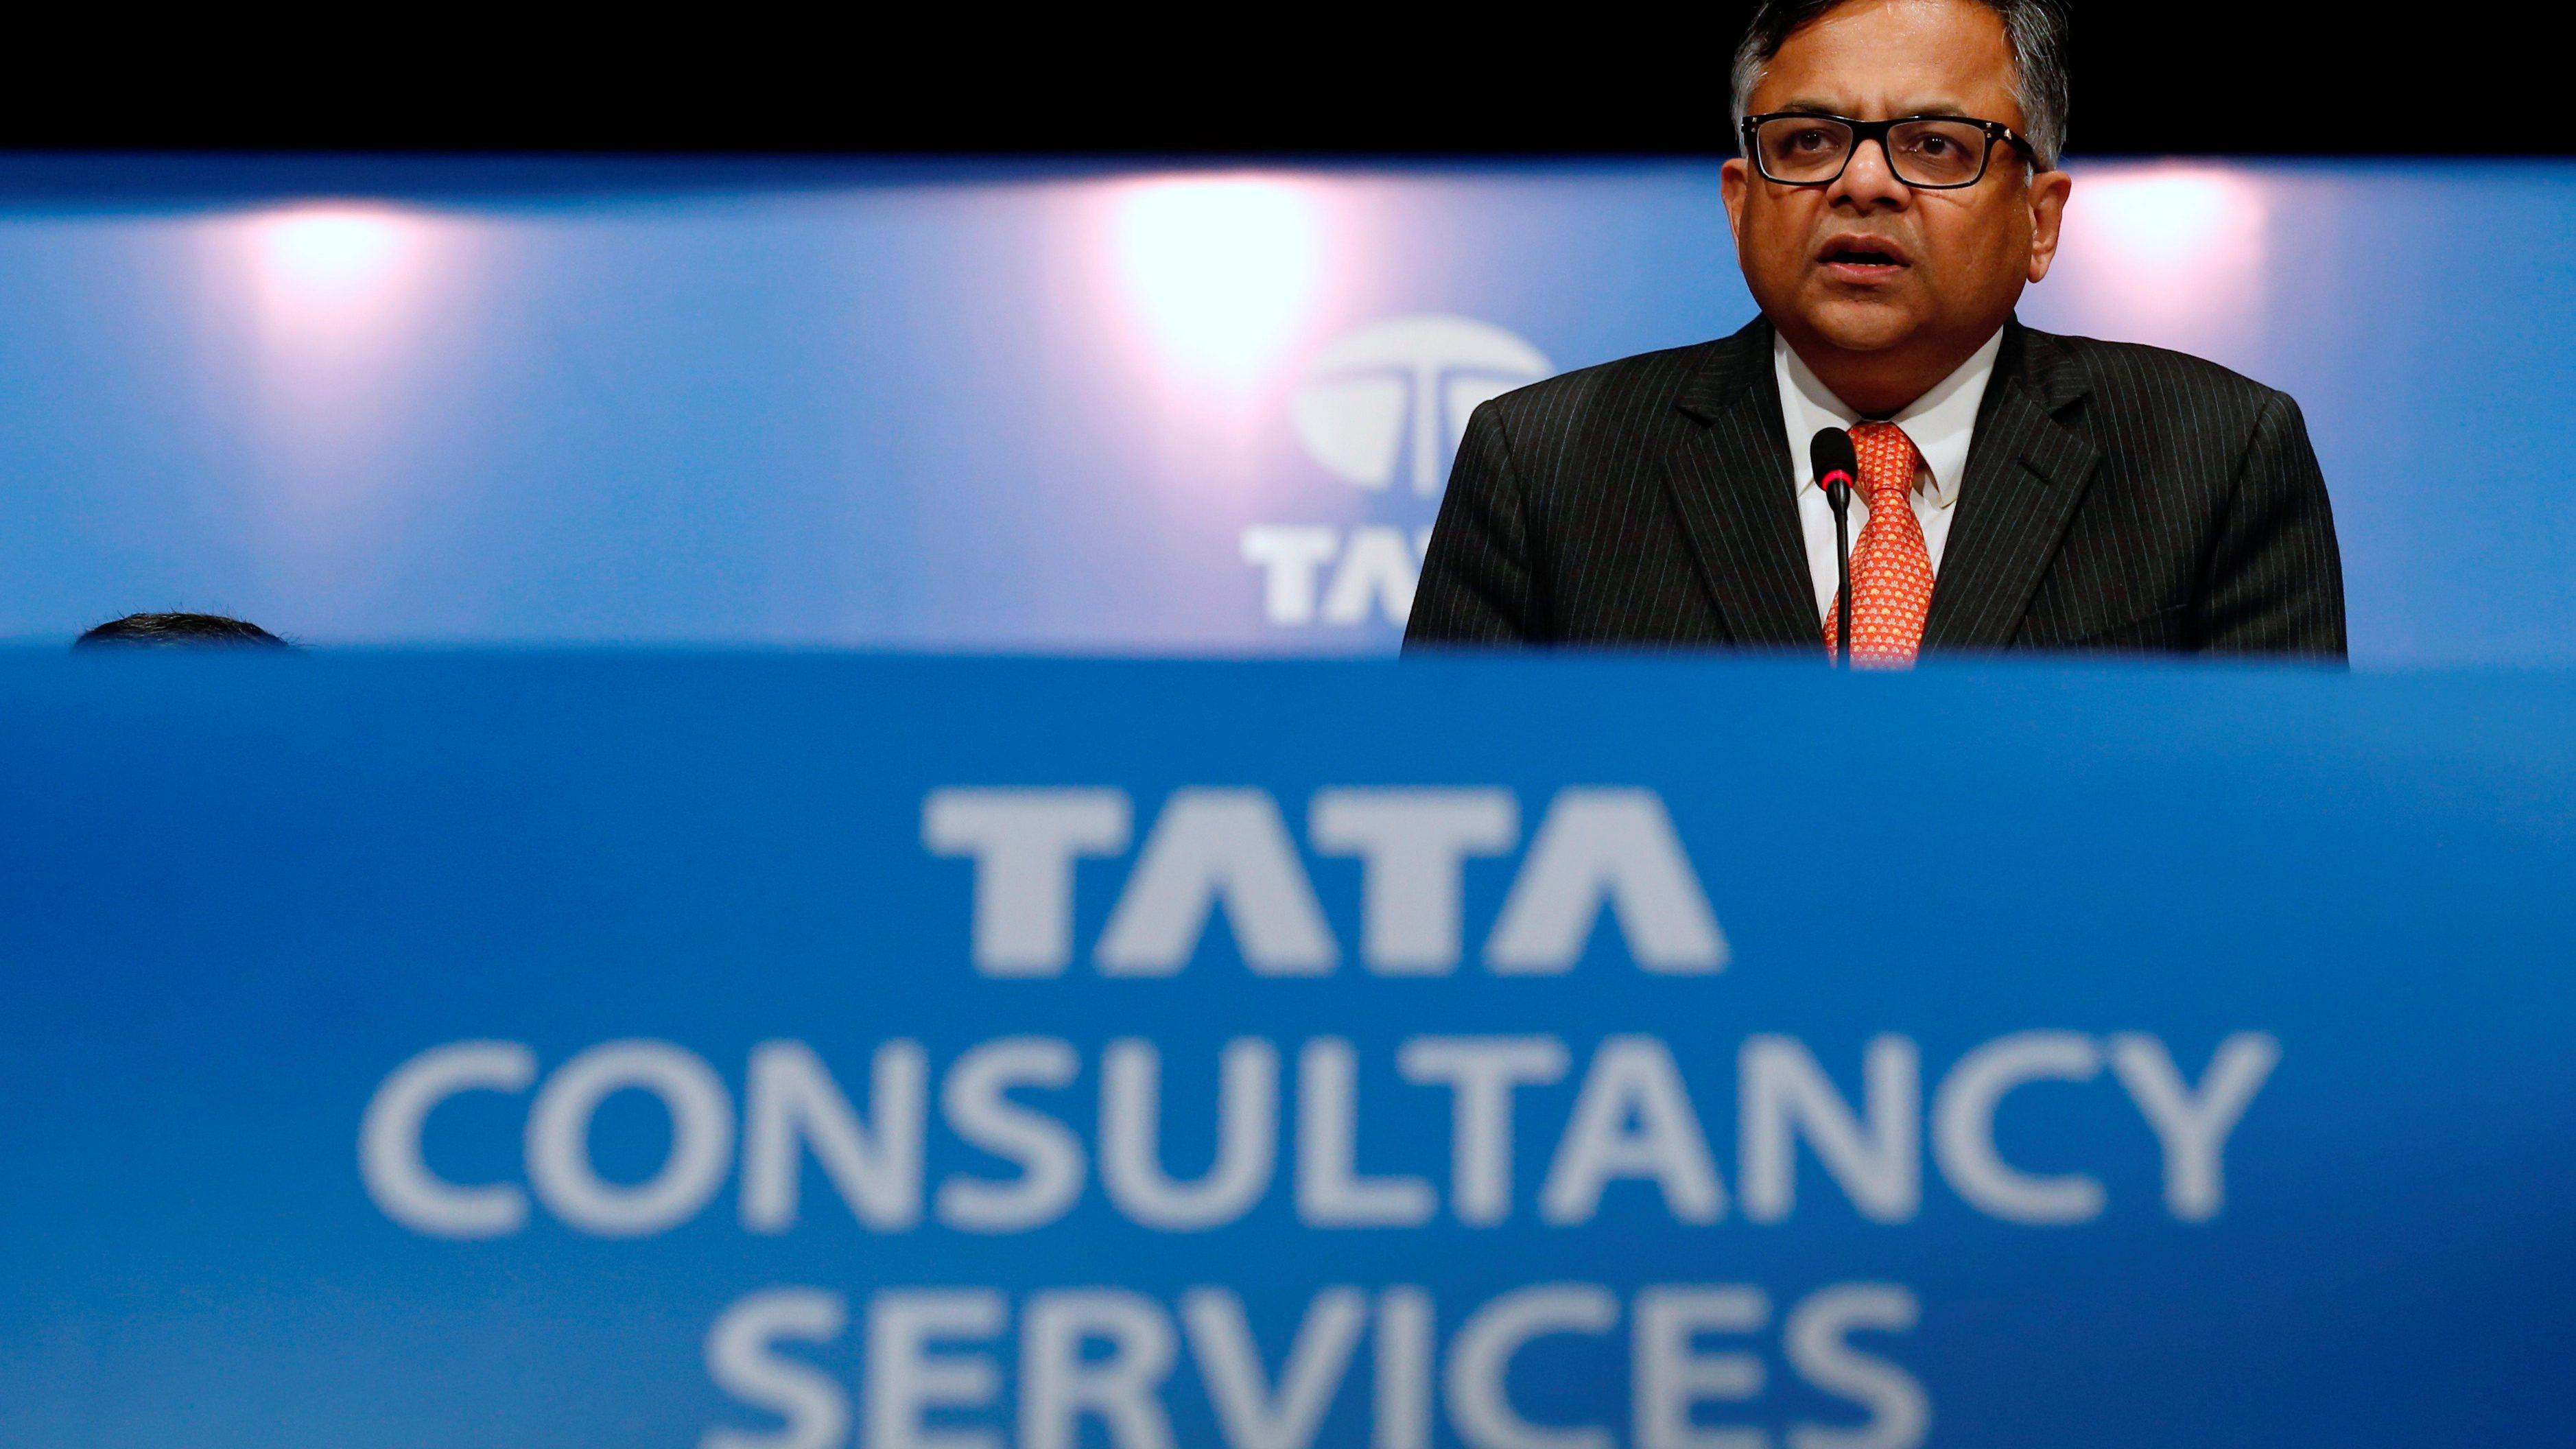 Tata Sons Chairman Natarajan Chandrasekaran speaks to shareholders during the Tata Consultancy Services (TCS) annual general meeting in Mumbai